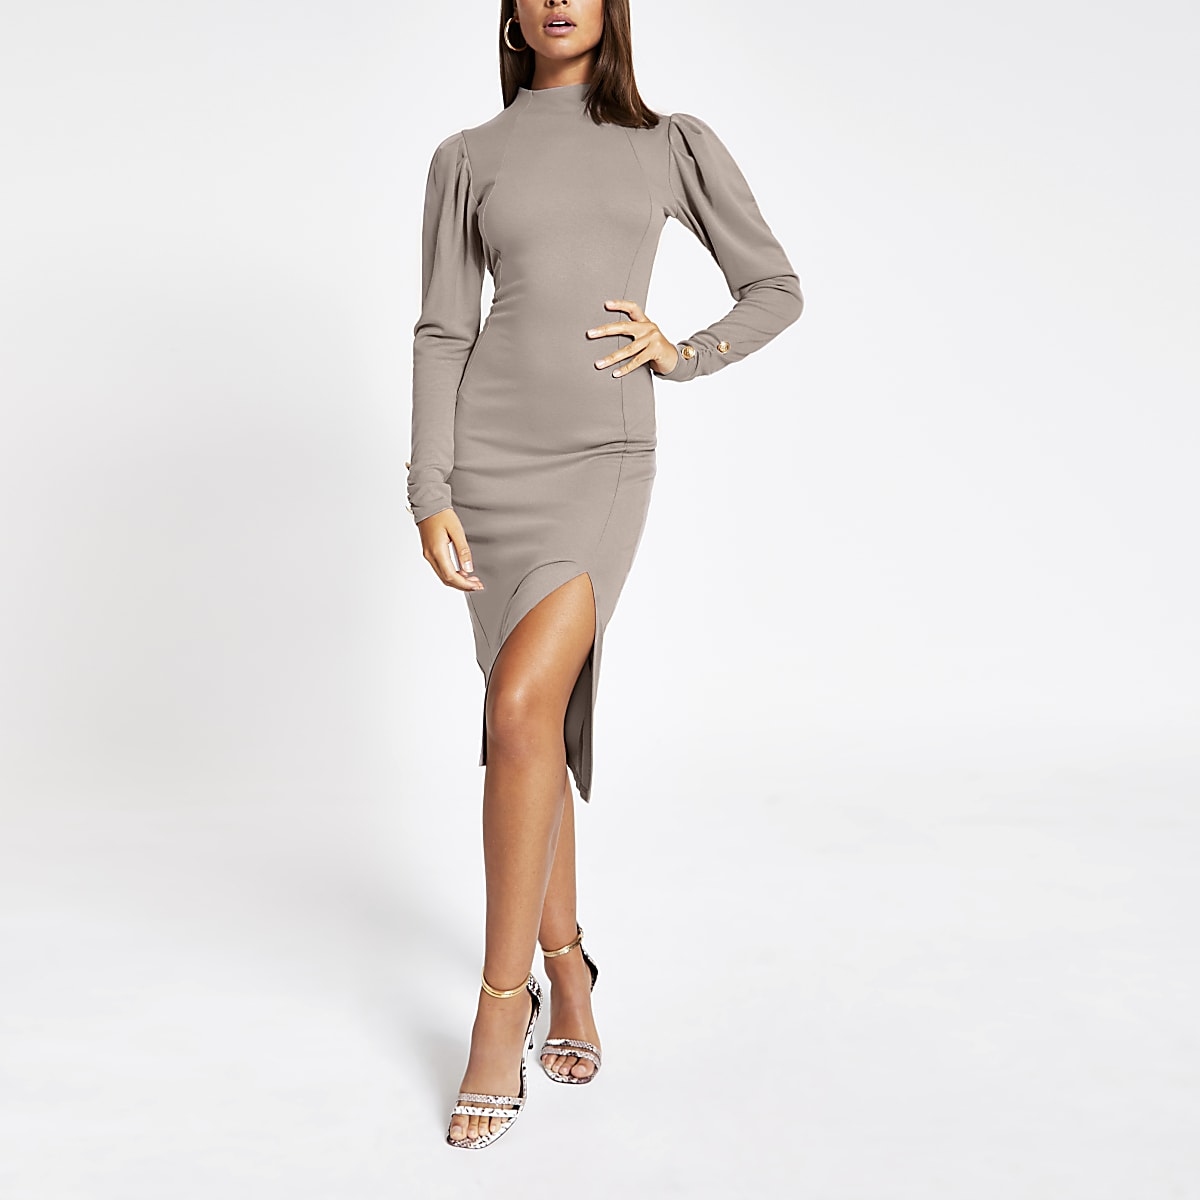 Beige long sleeve bodycon midi dress